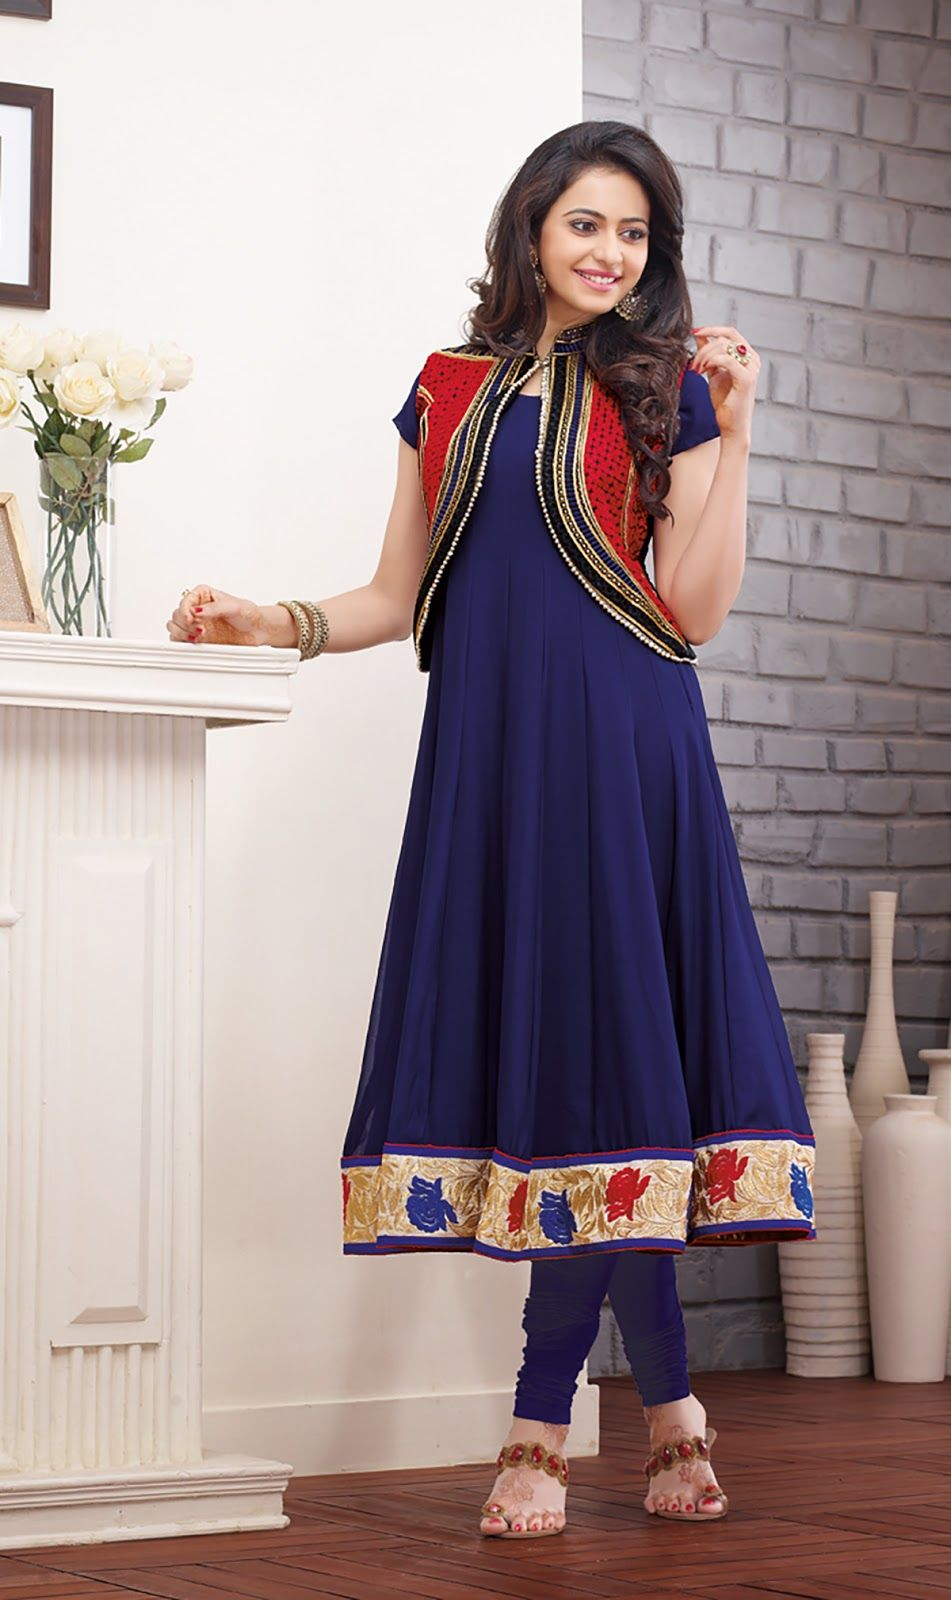 f69182fed67 Beautiful koti frocks designs for girls - Sari Info | Fashion in ...